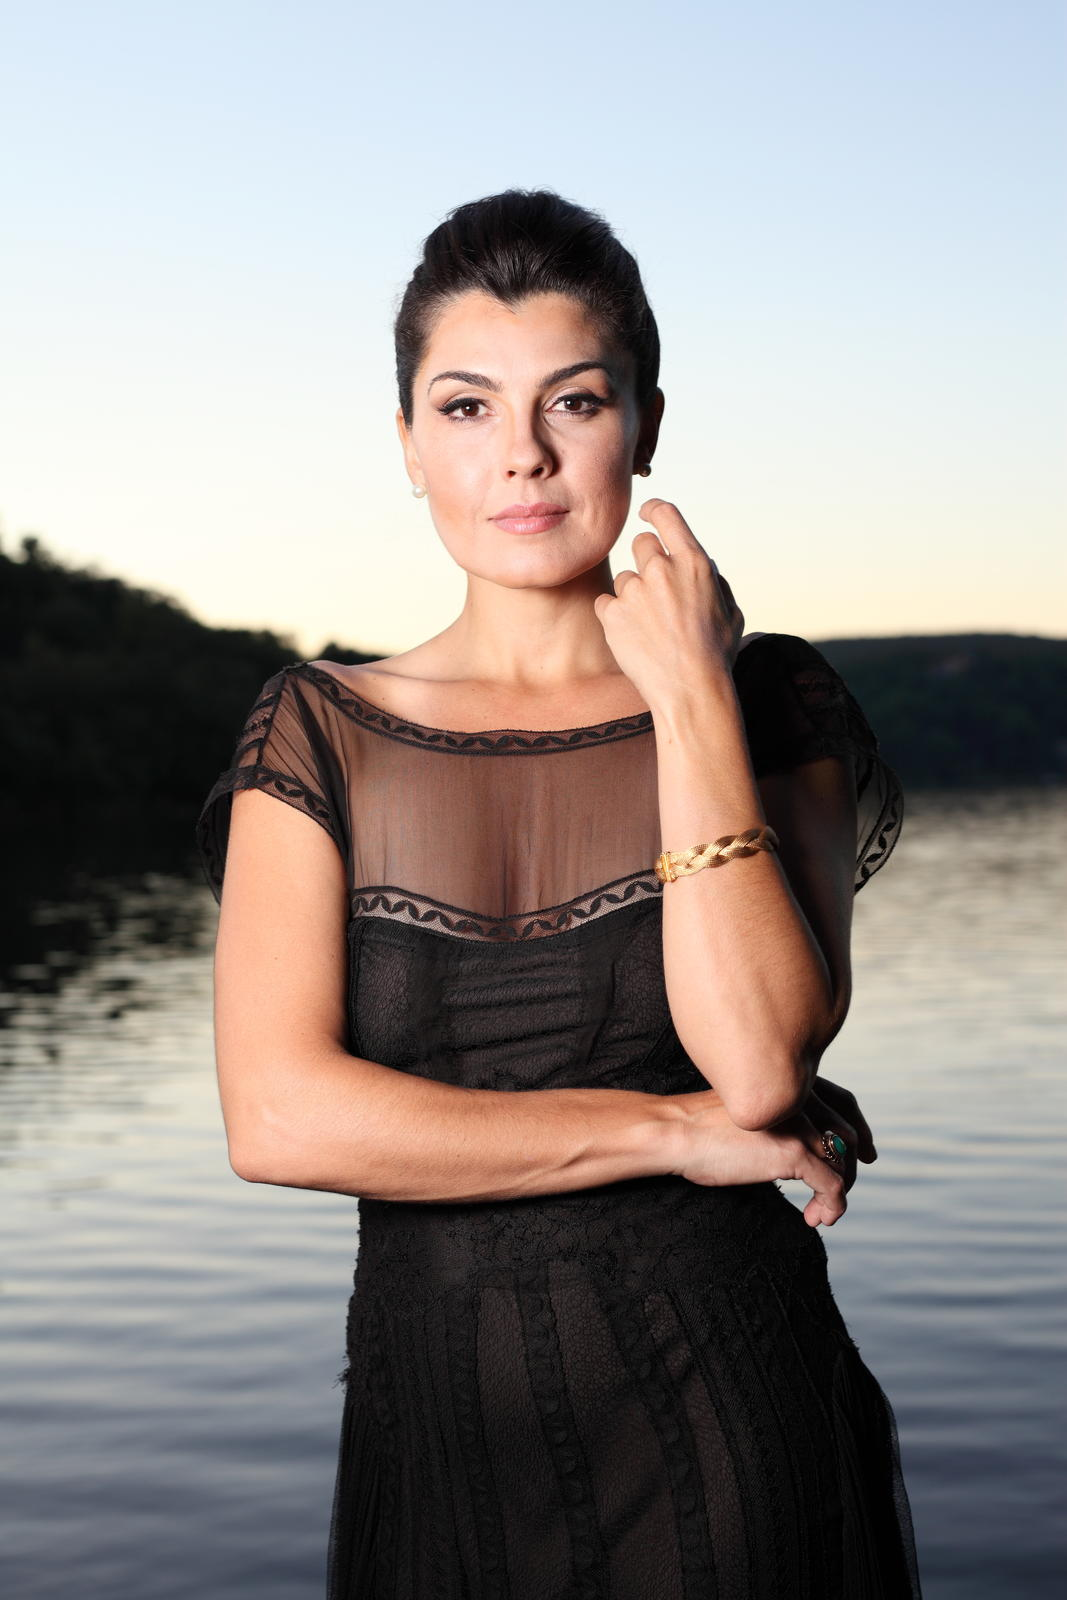 Angelica de la Riva. Photo by Alcir N. Silva